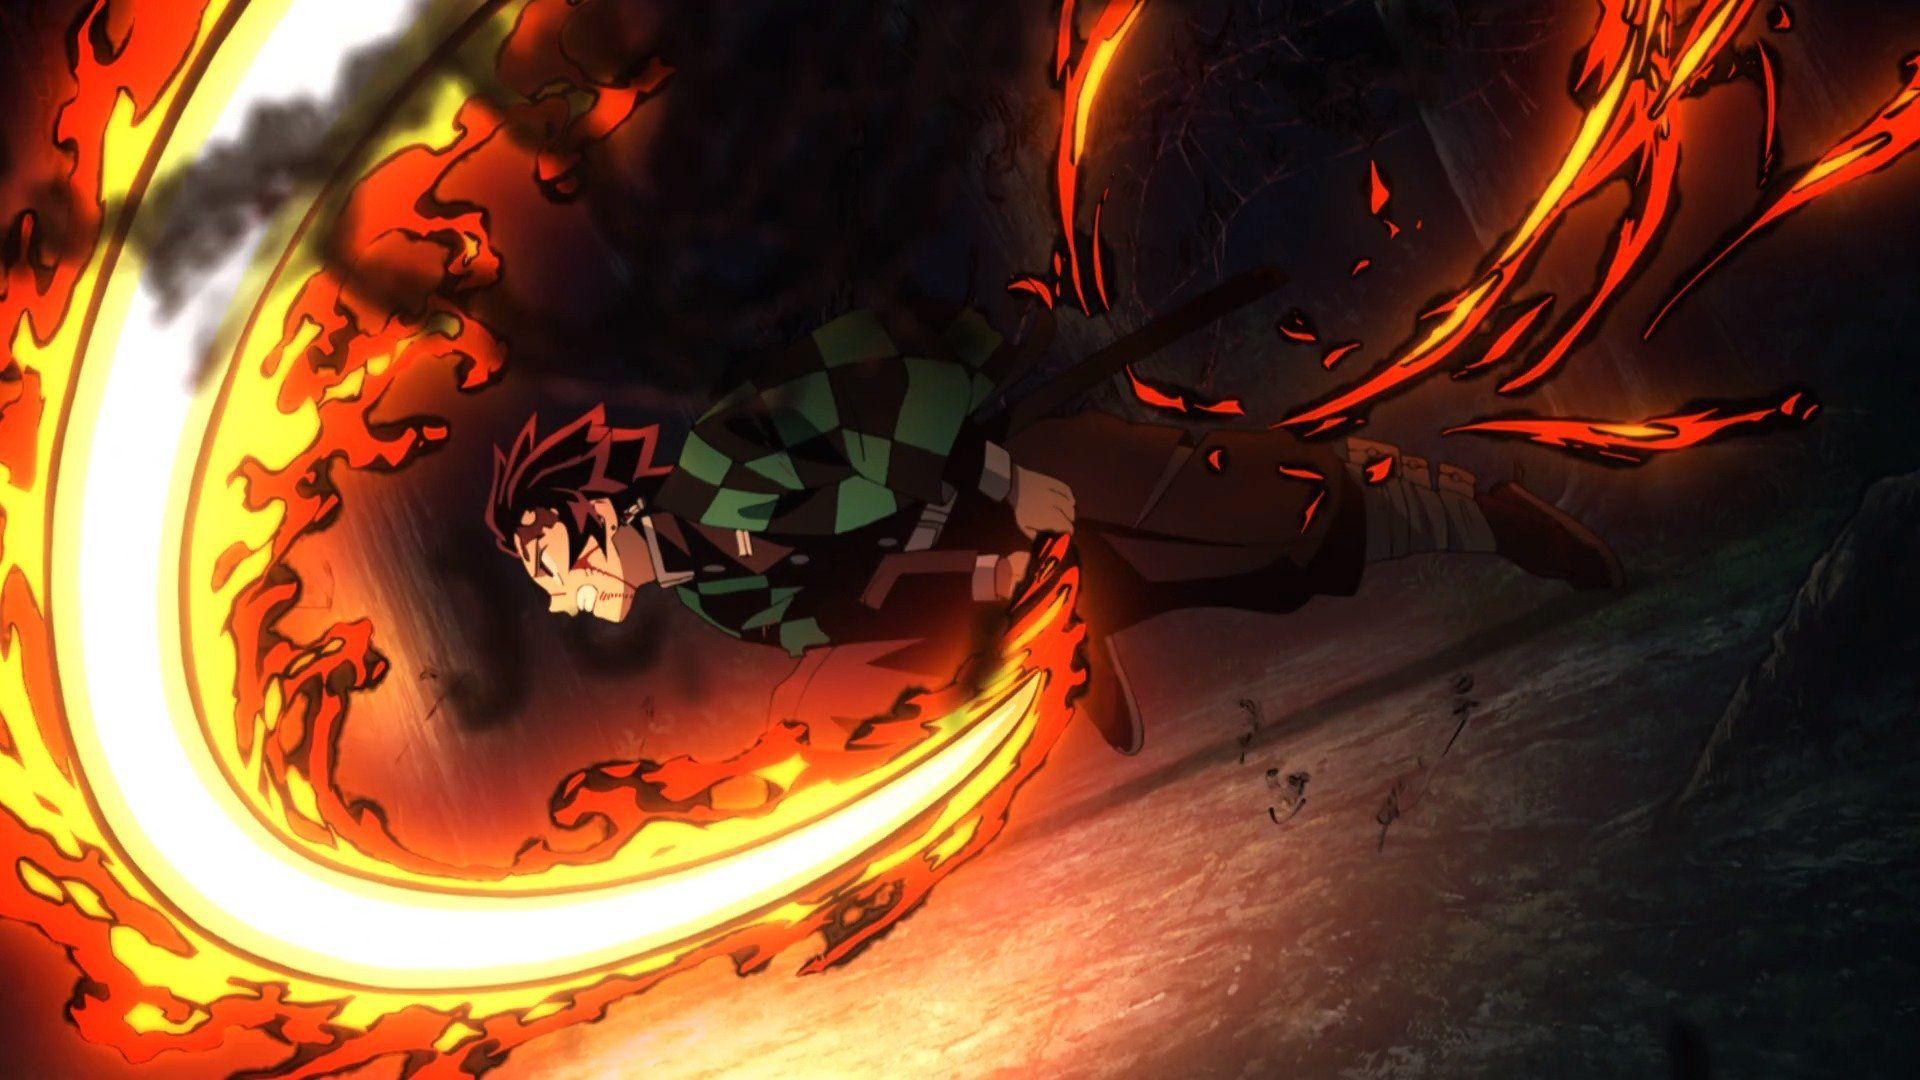 Demon Slayer Kimetsu No Yaiba Chapter 204 Release Date Spoilers Manga Series To End As Tanjiro Returns Home In 2020 Demon Slayer Anime Fan